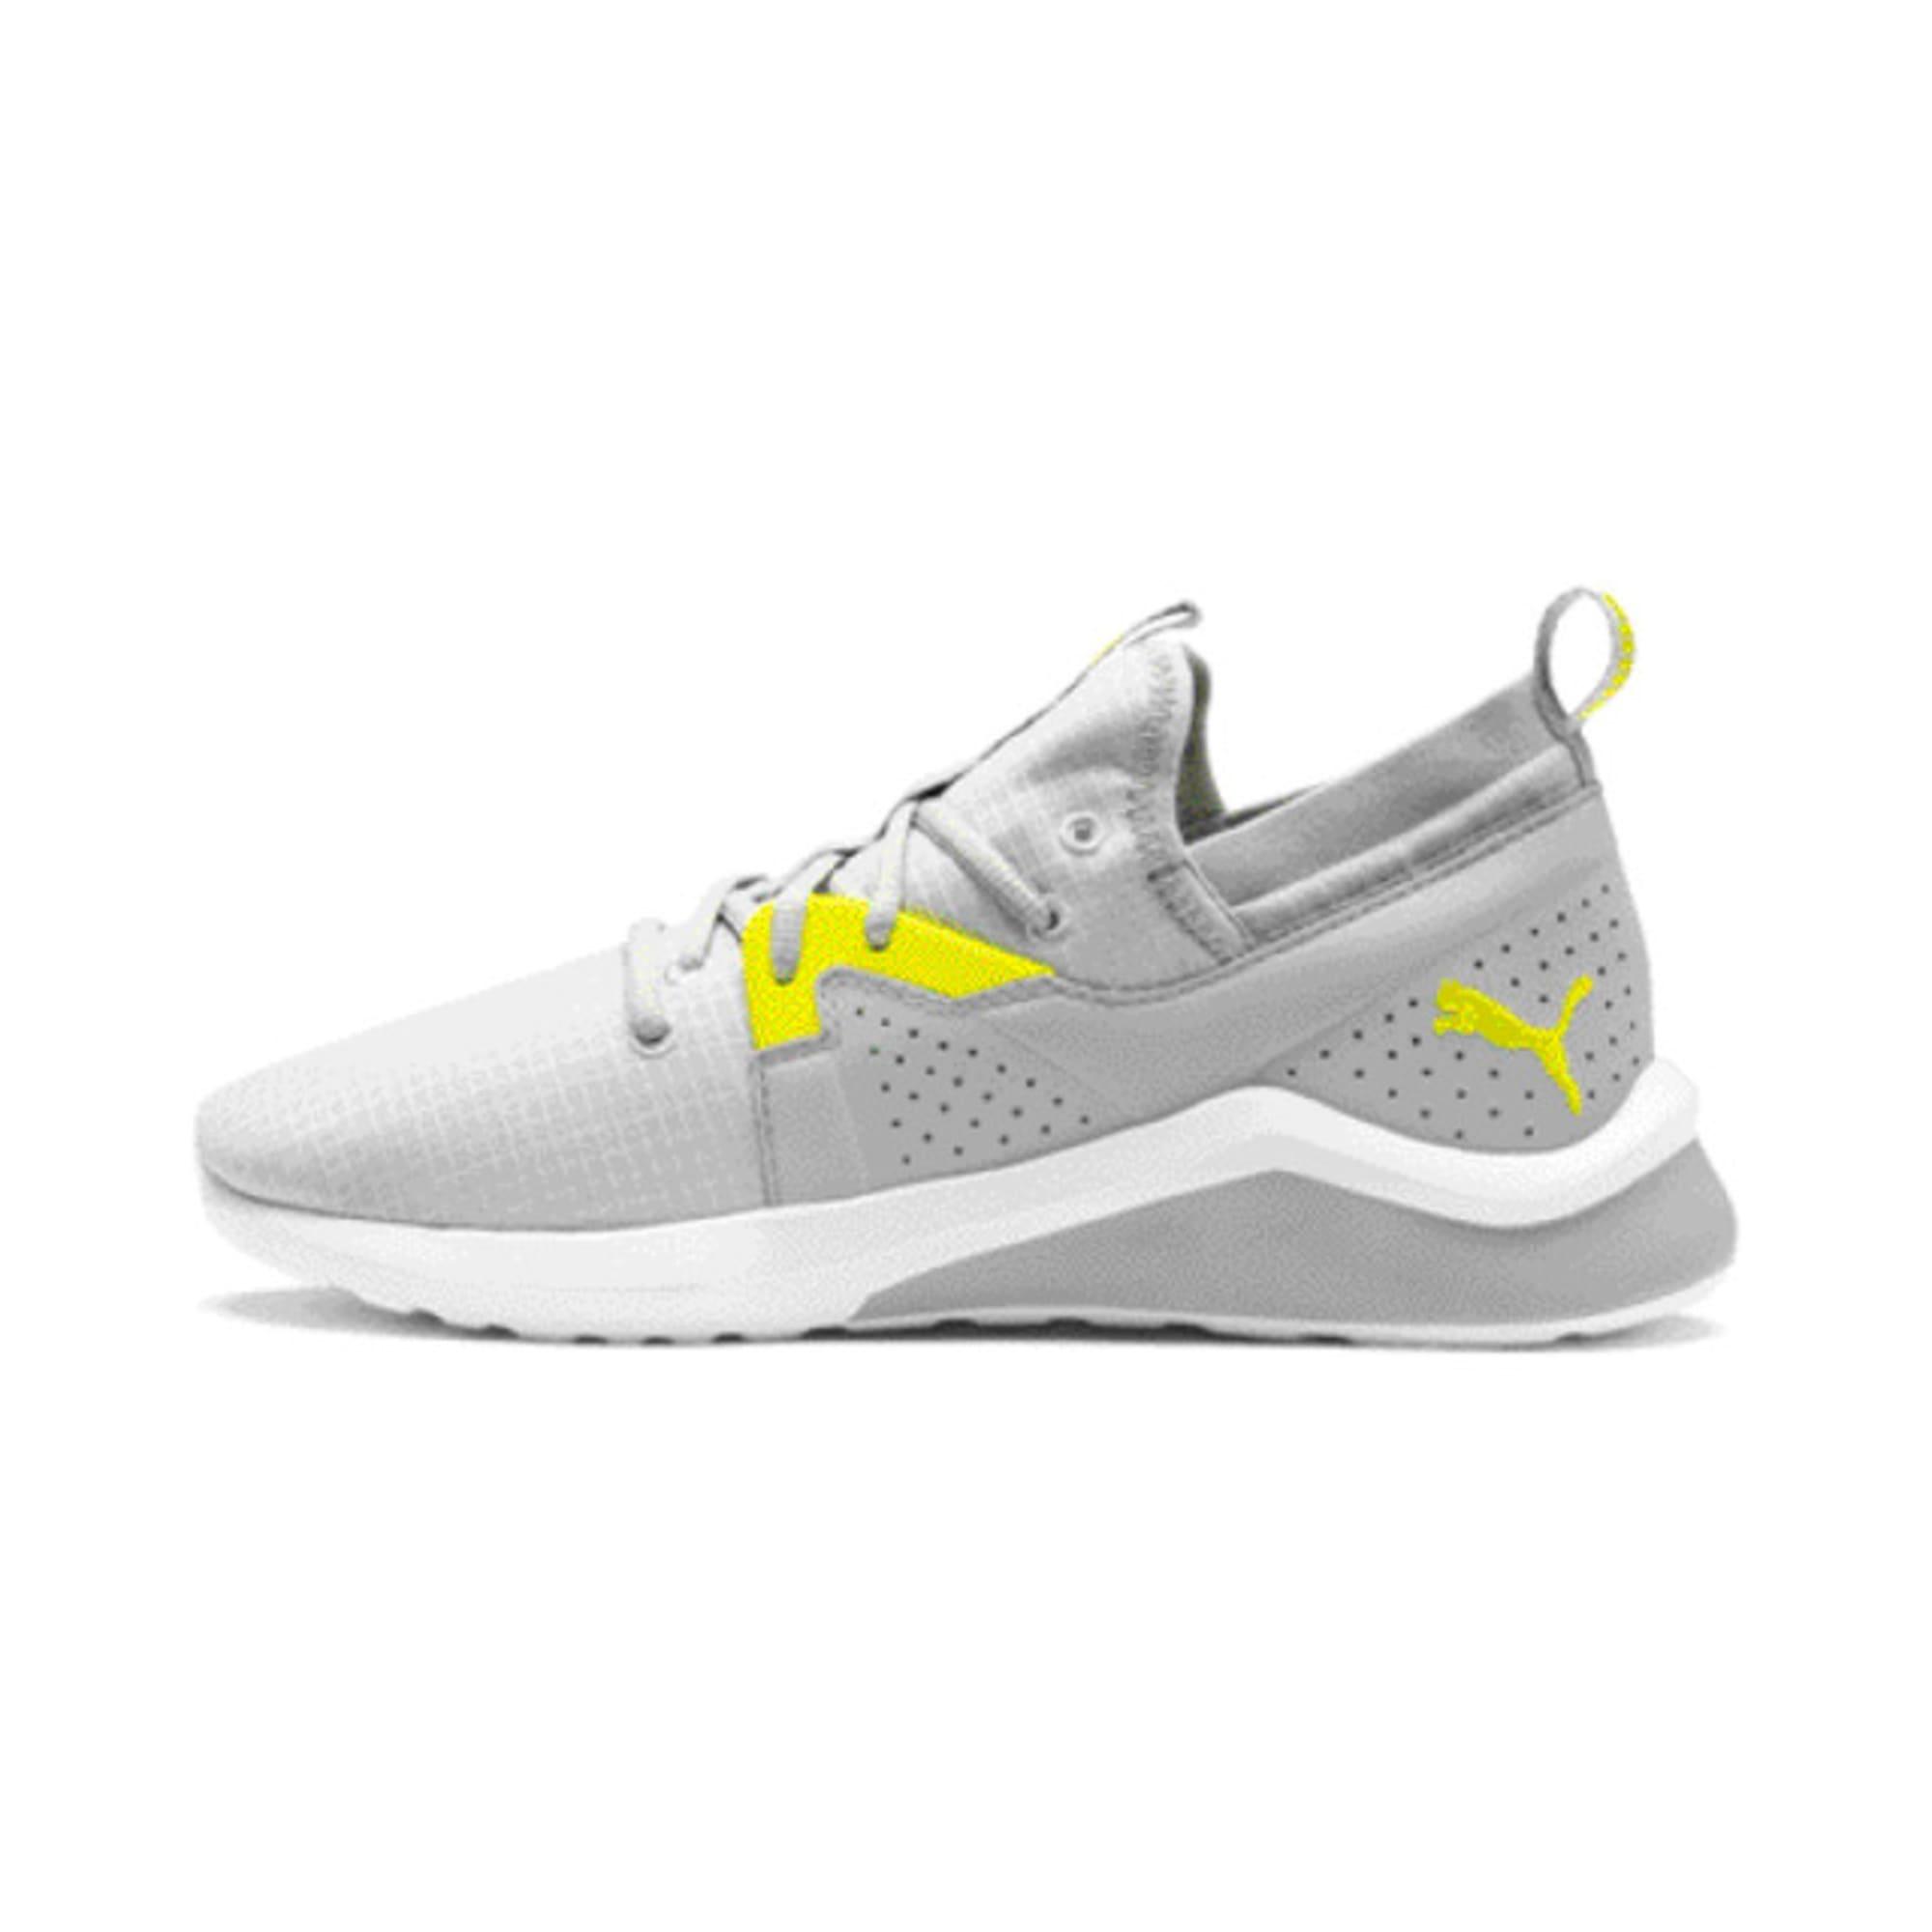 Thumbnail 1 of Emergence Lights Men's Running Shoes, High Rise-Yellow Alert, medium-IND